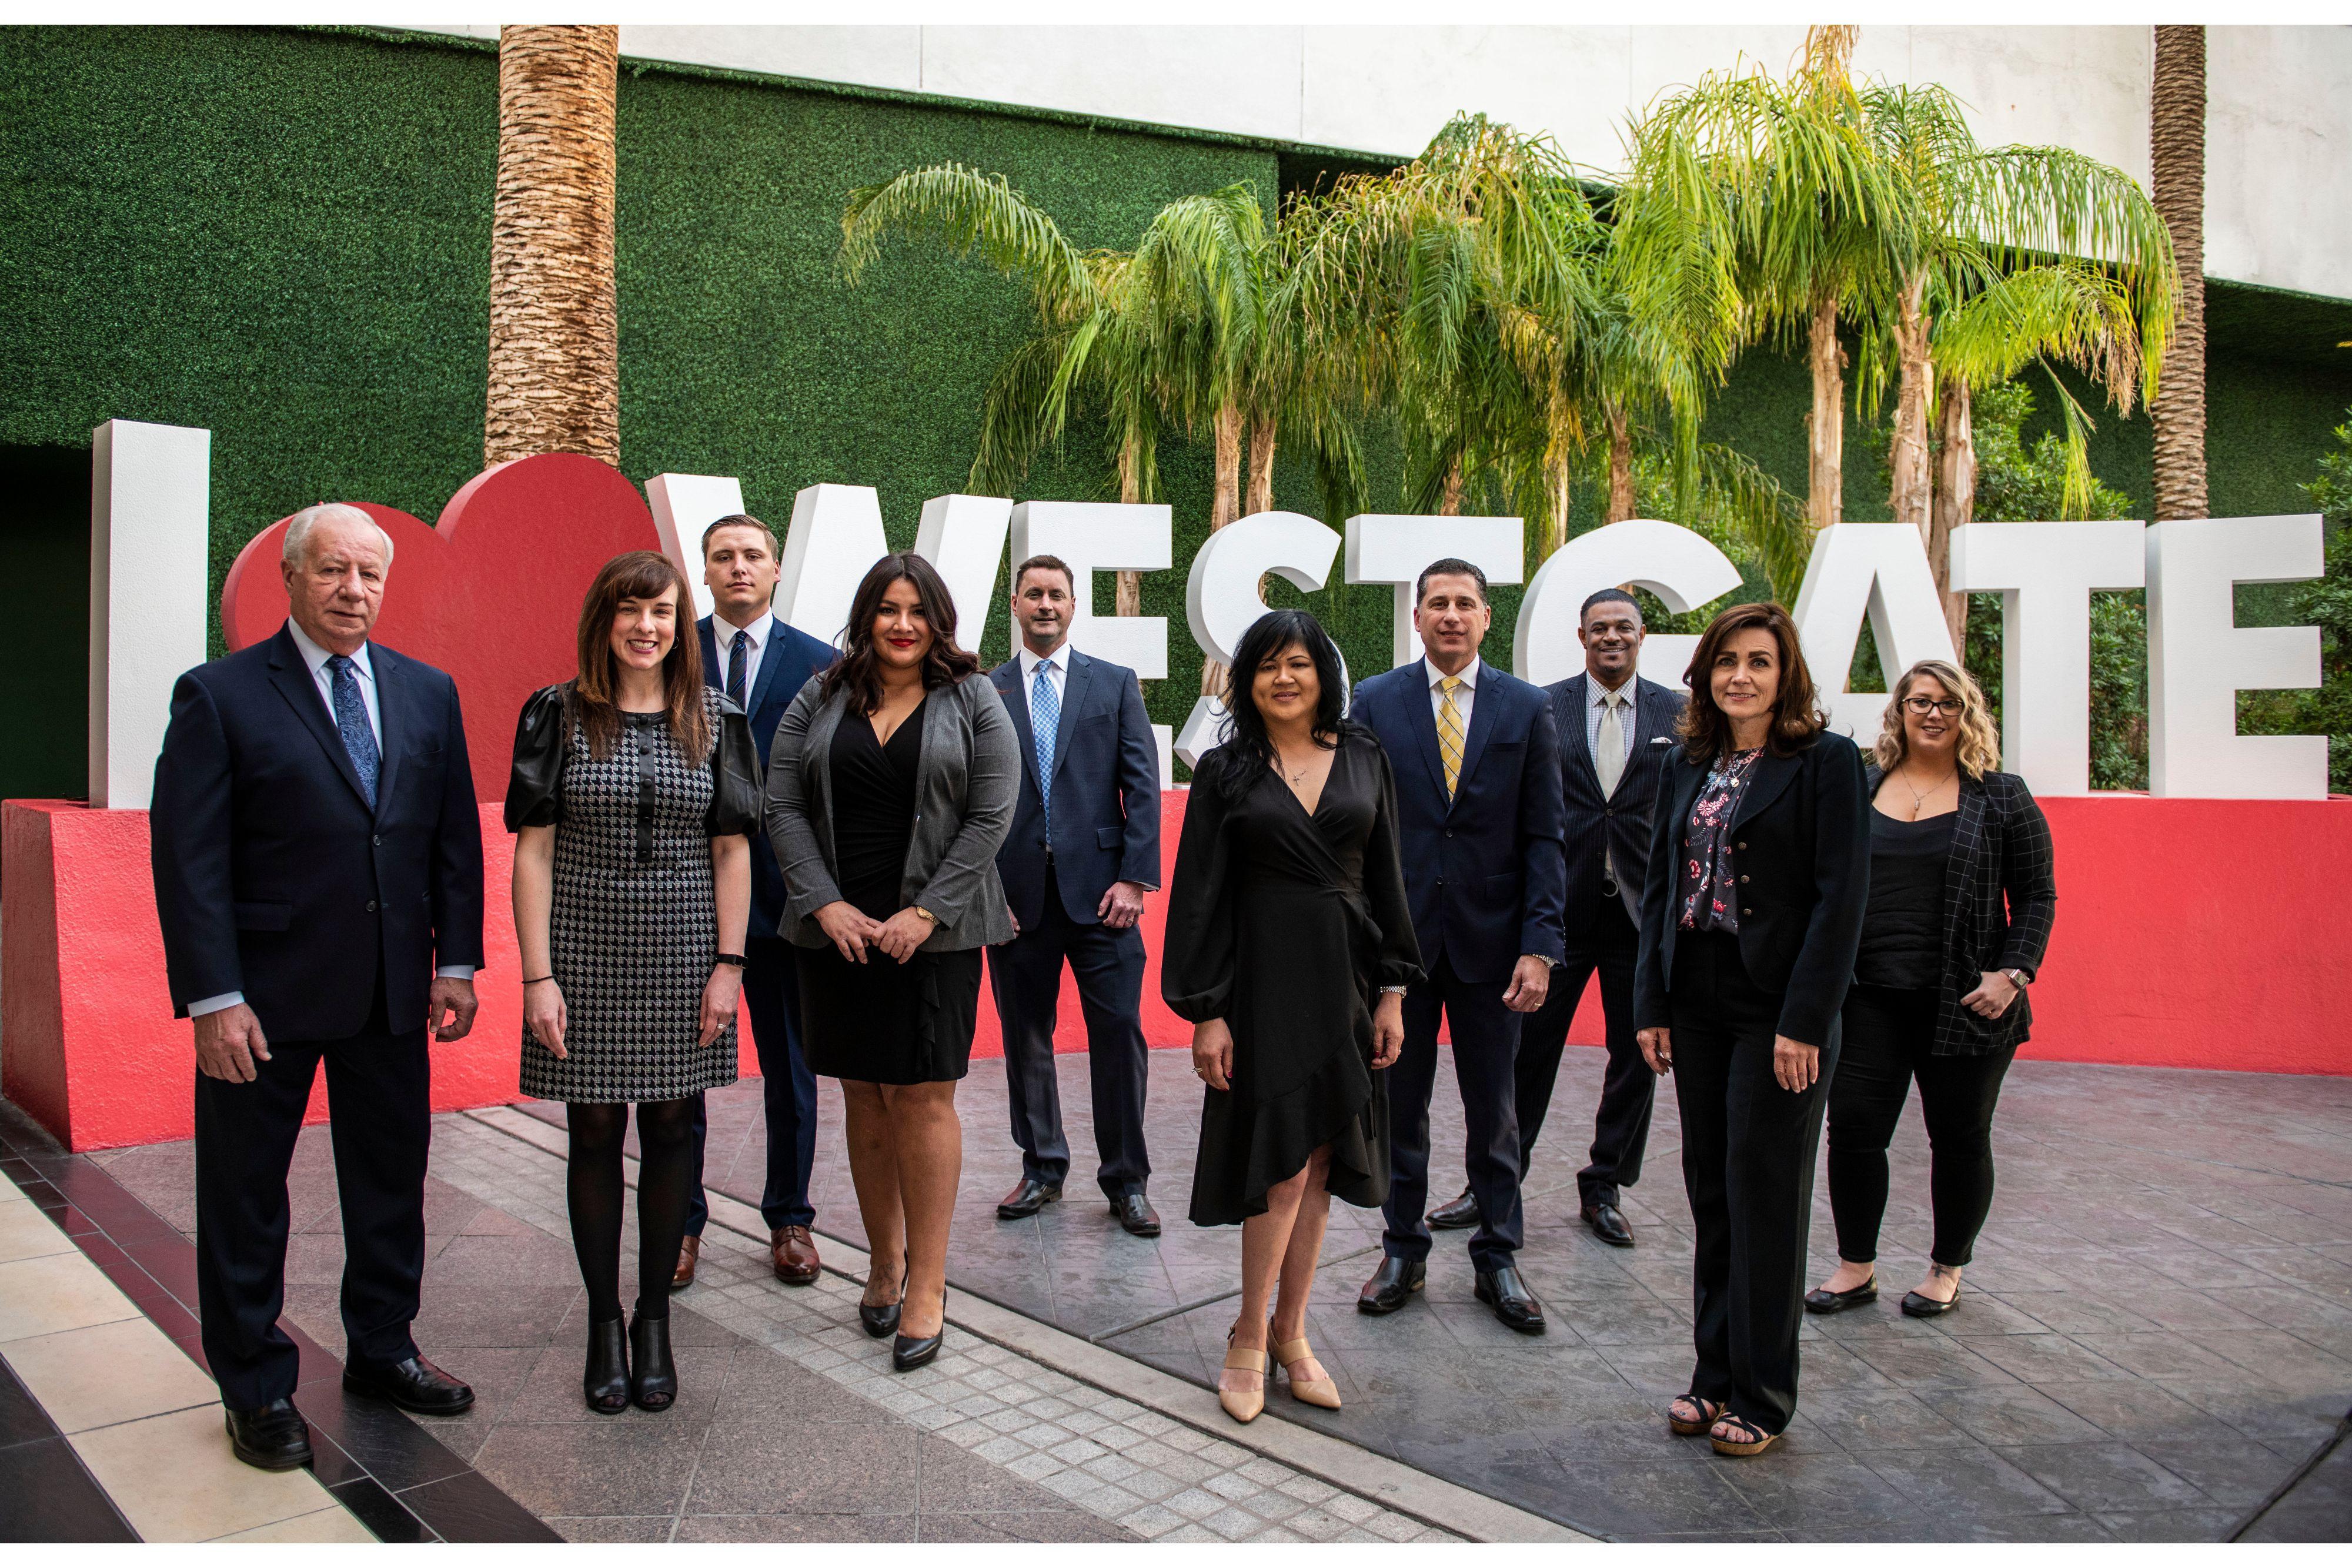 Meet your Westgate Las Vegas Casino Hosts | Group of Casino Hosts